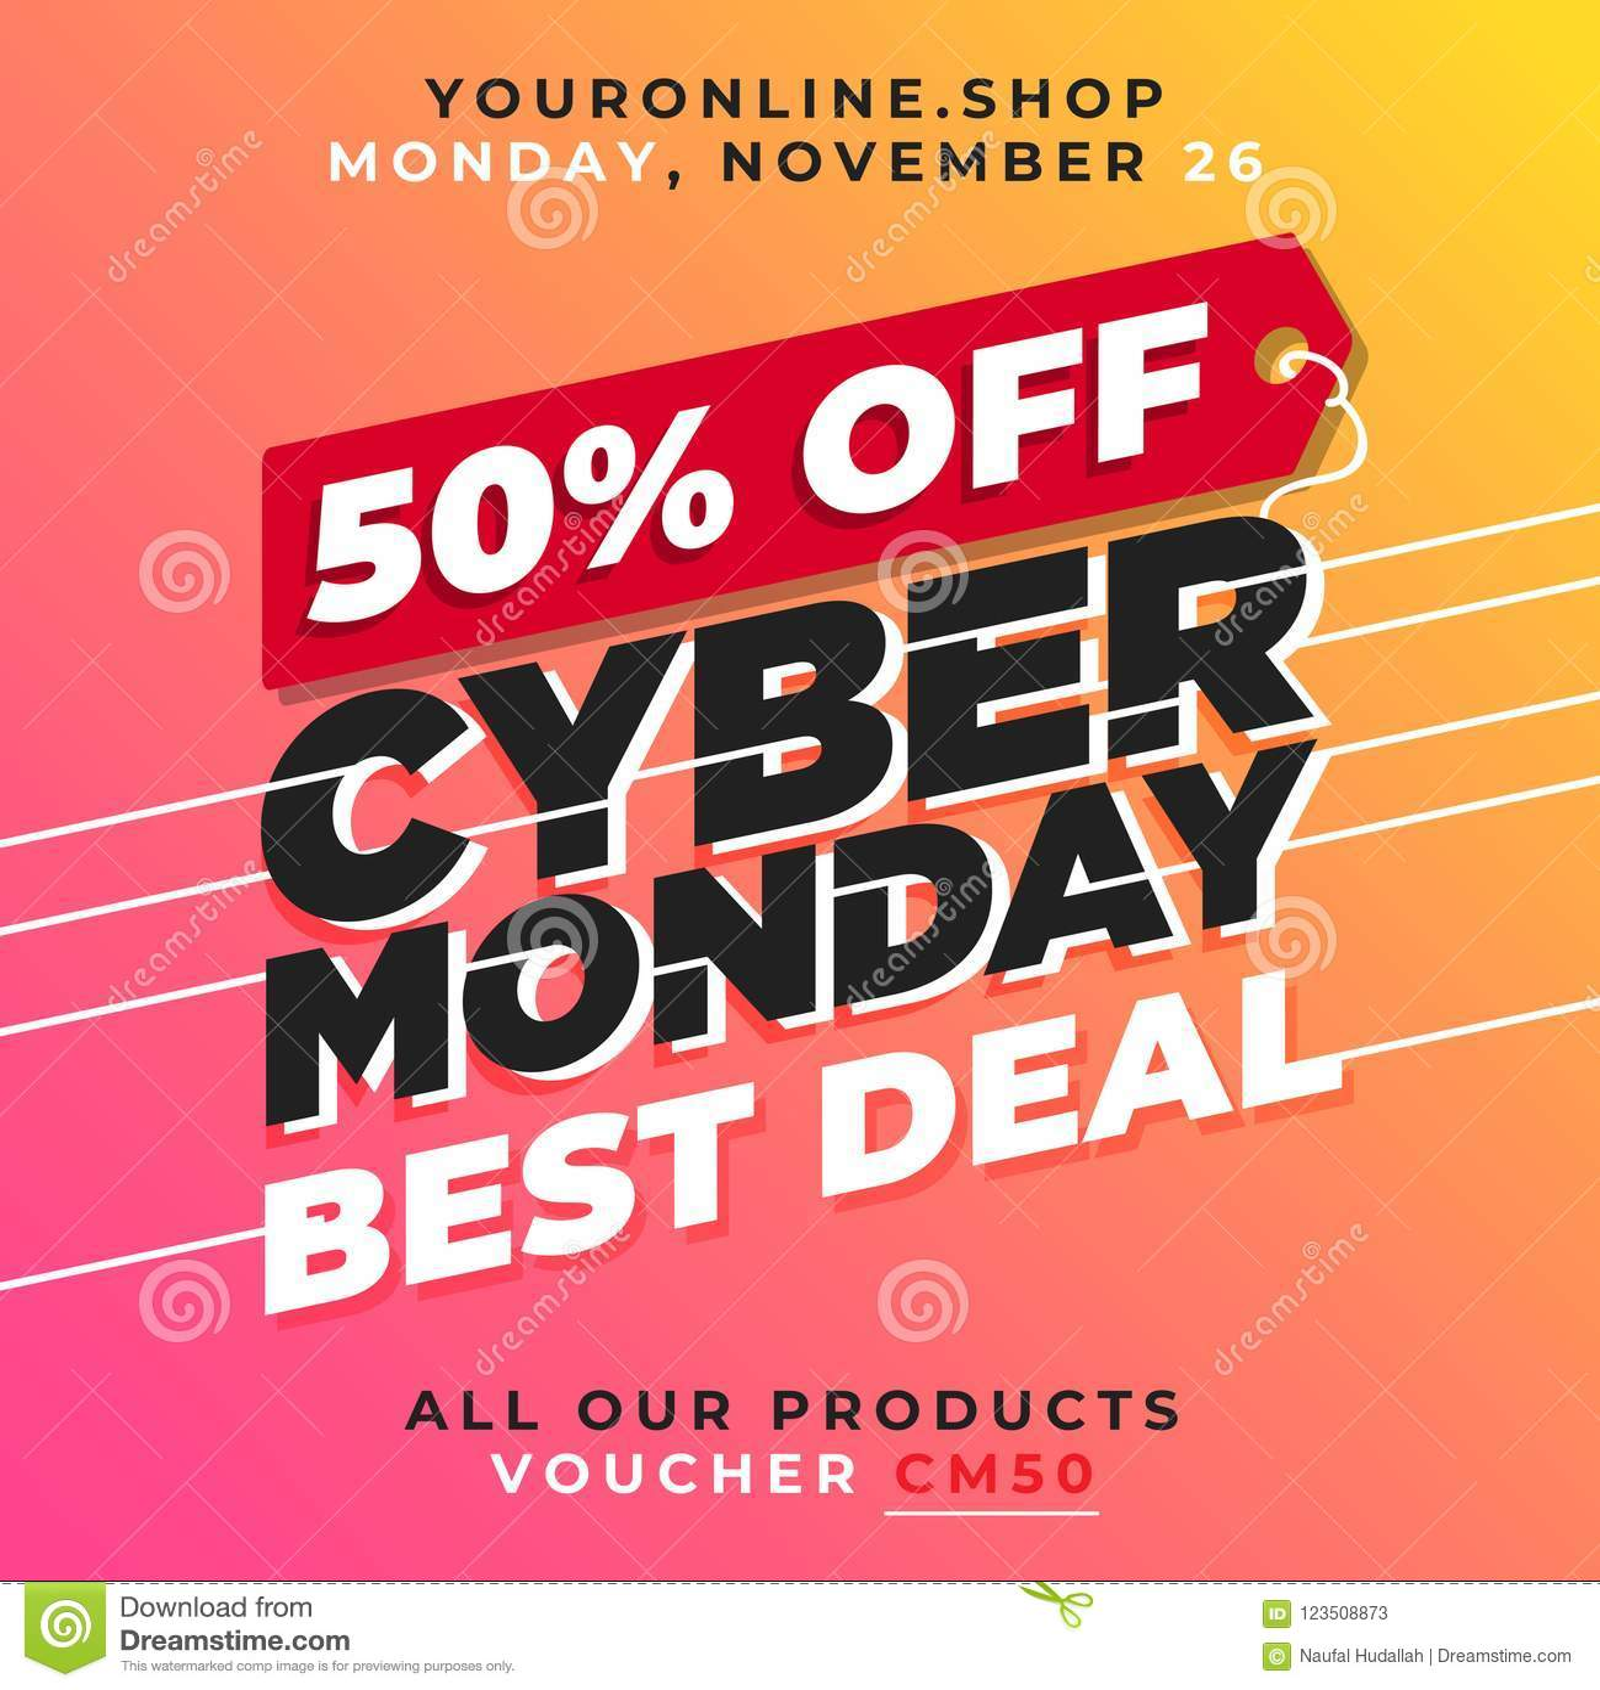 50% Off Cyber Monday Sale Vector. Best Deal Online Shop